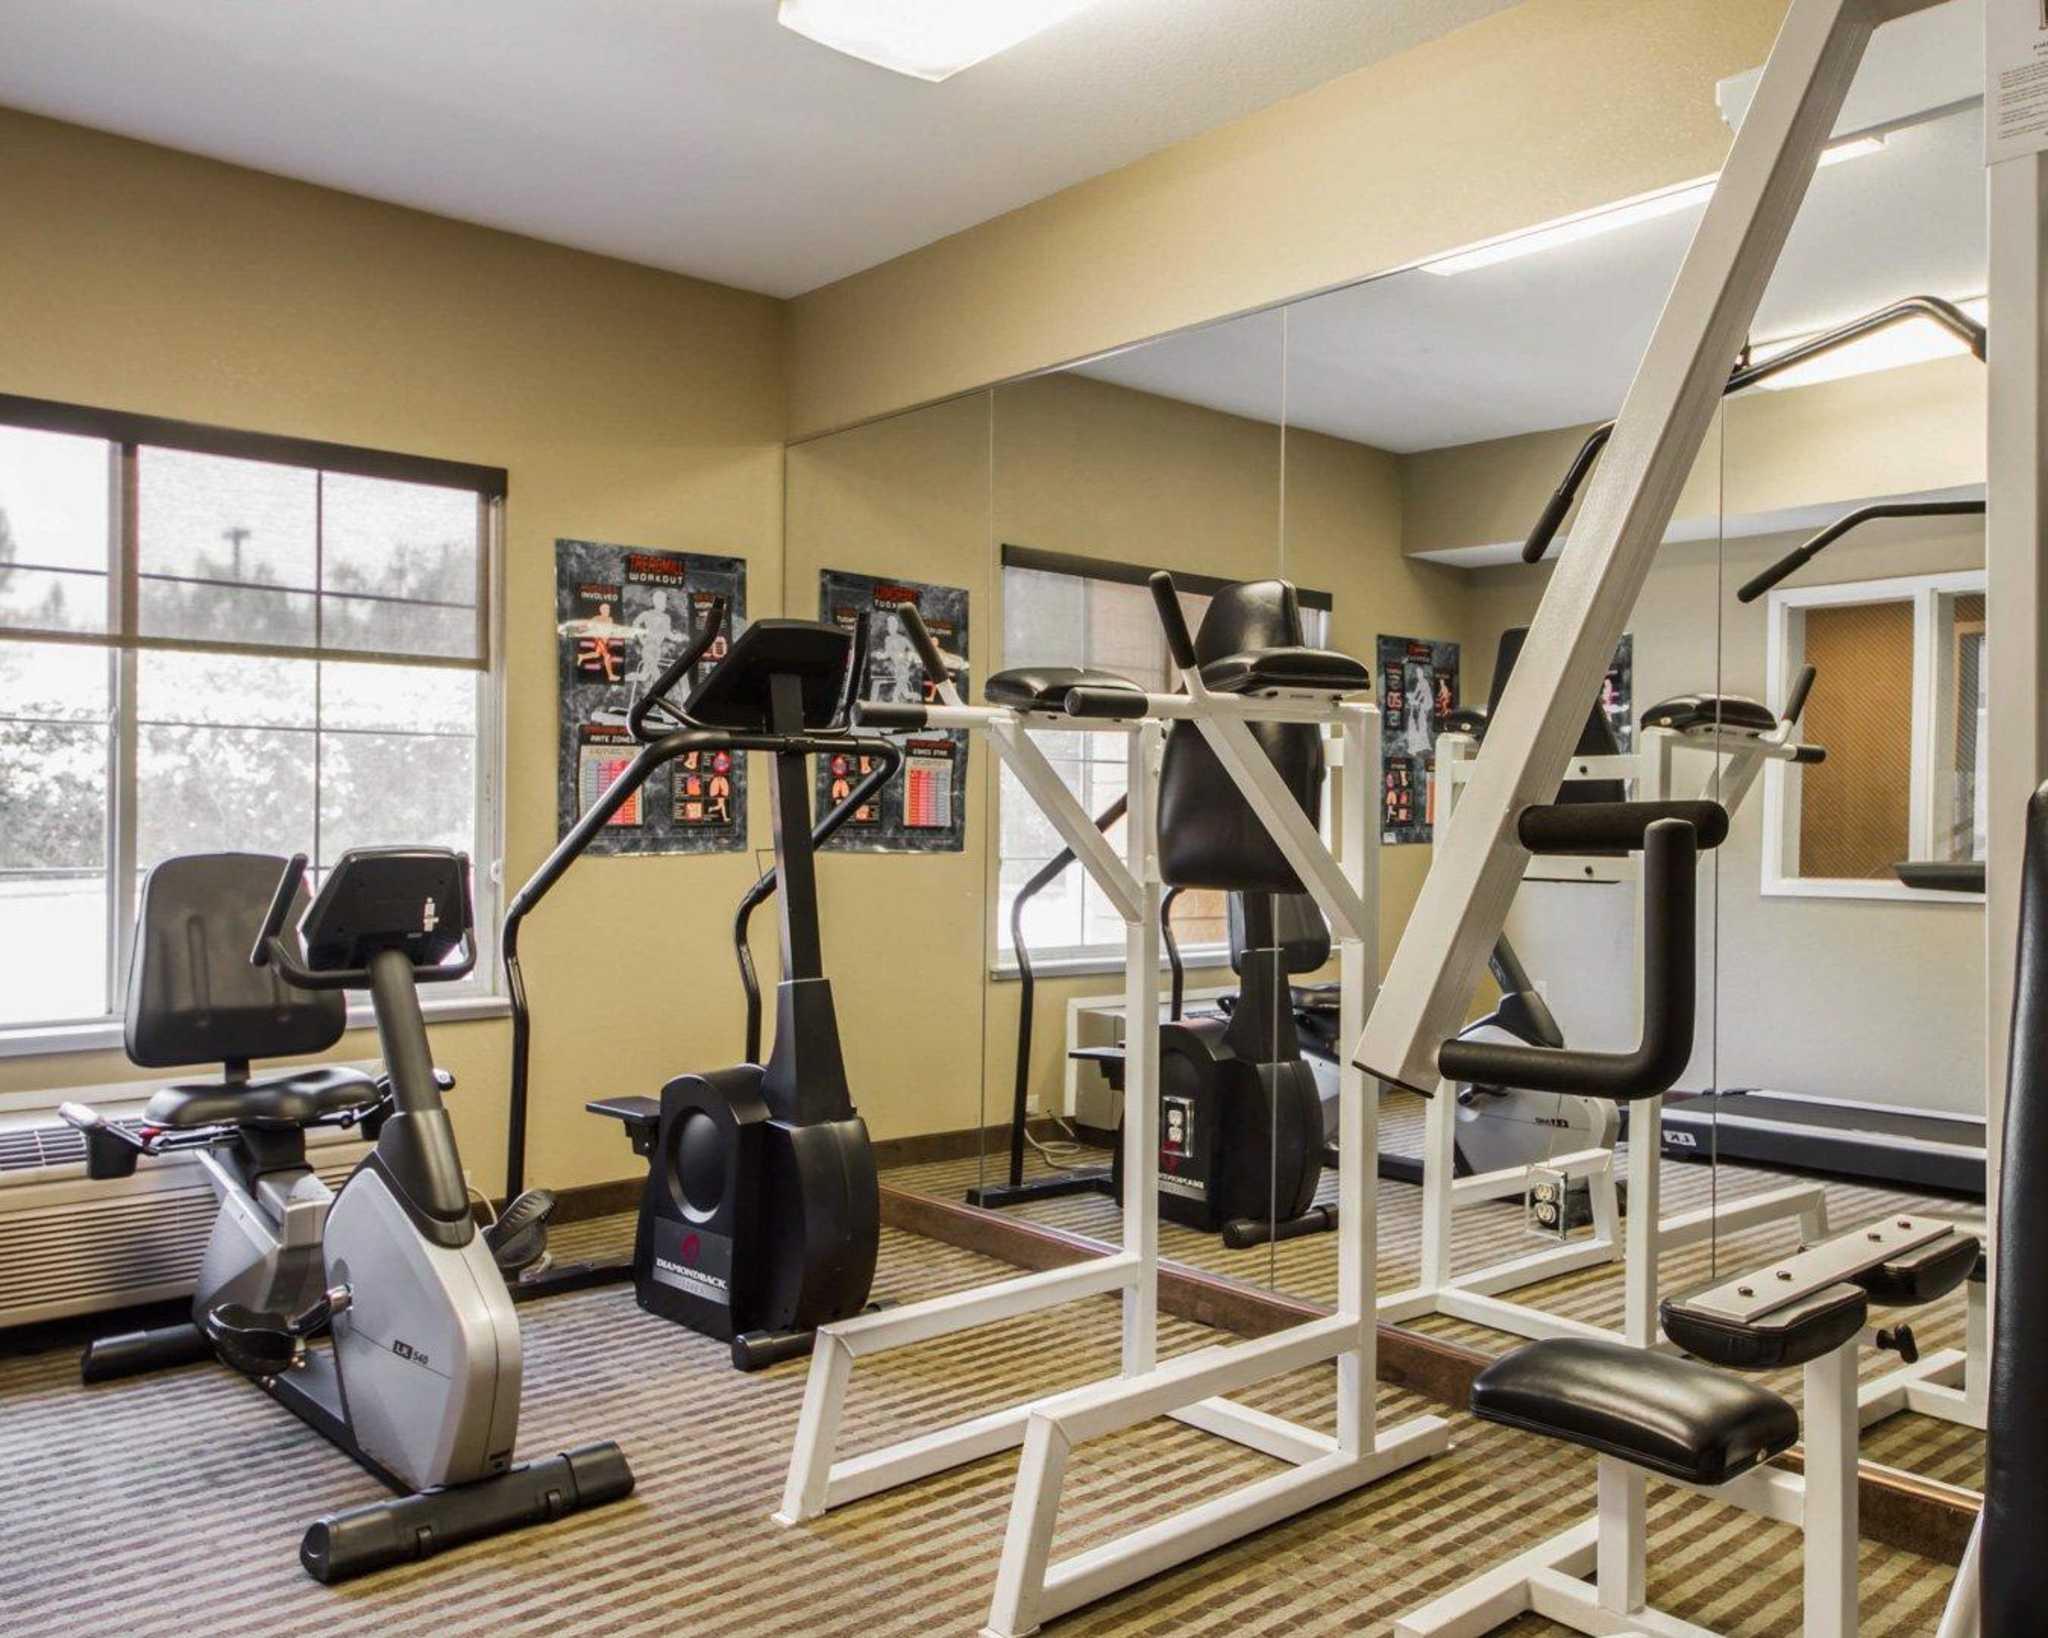 Comfort Inn & Suites Sacramento - University Area image 32